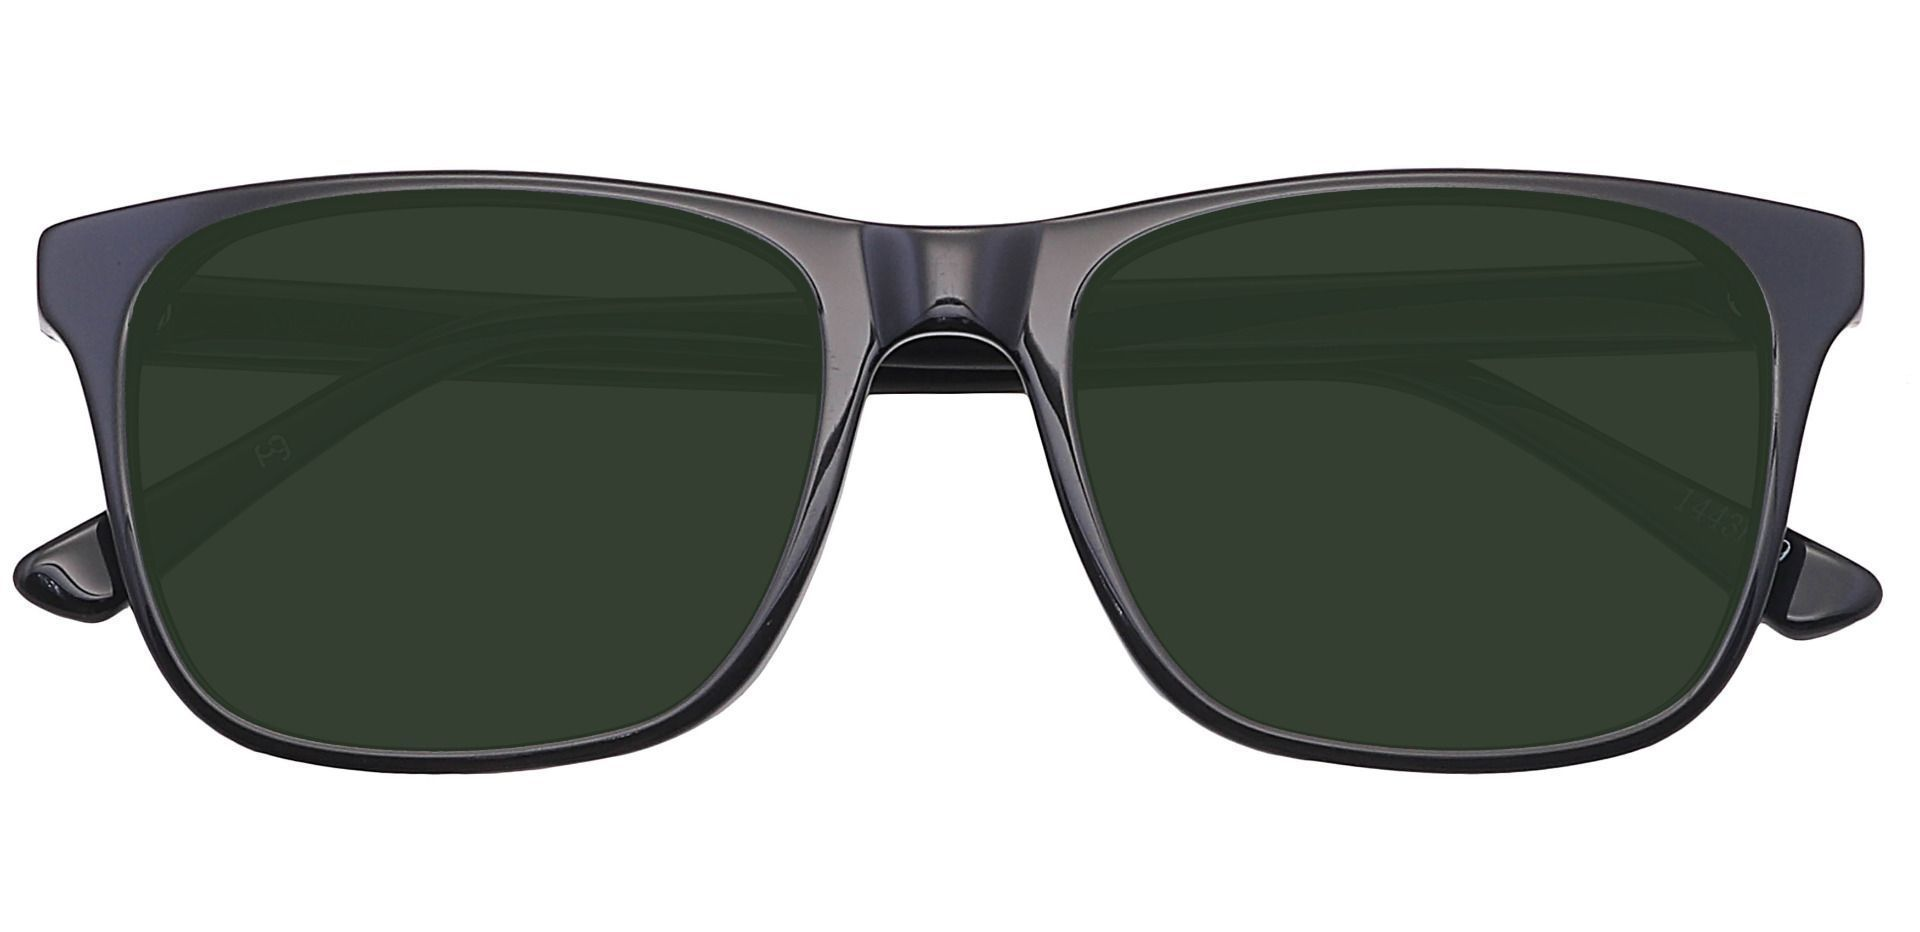 Cantina Square Prescription Sunglasses - Black Frame With Green Lenses